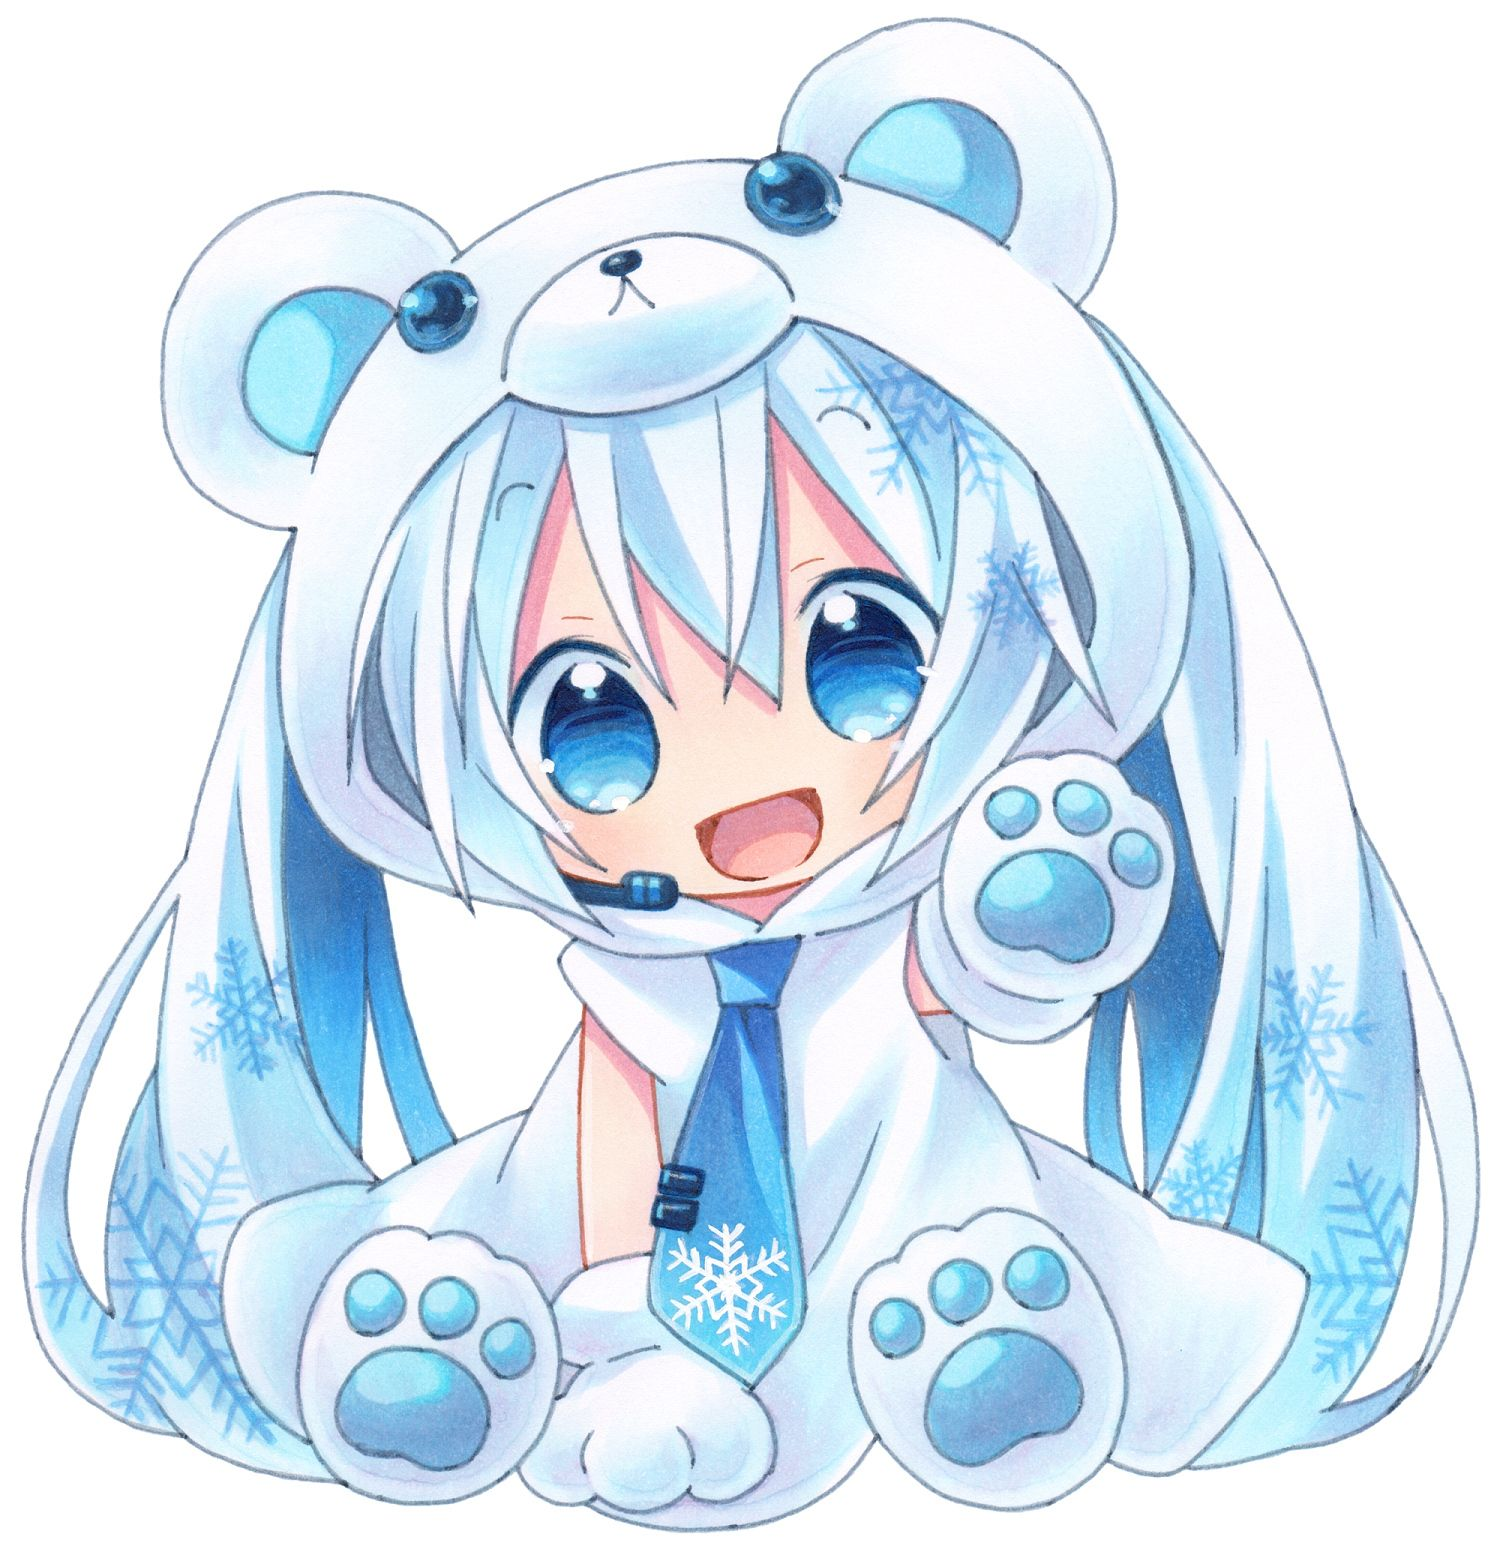 white micu,chan